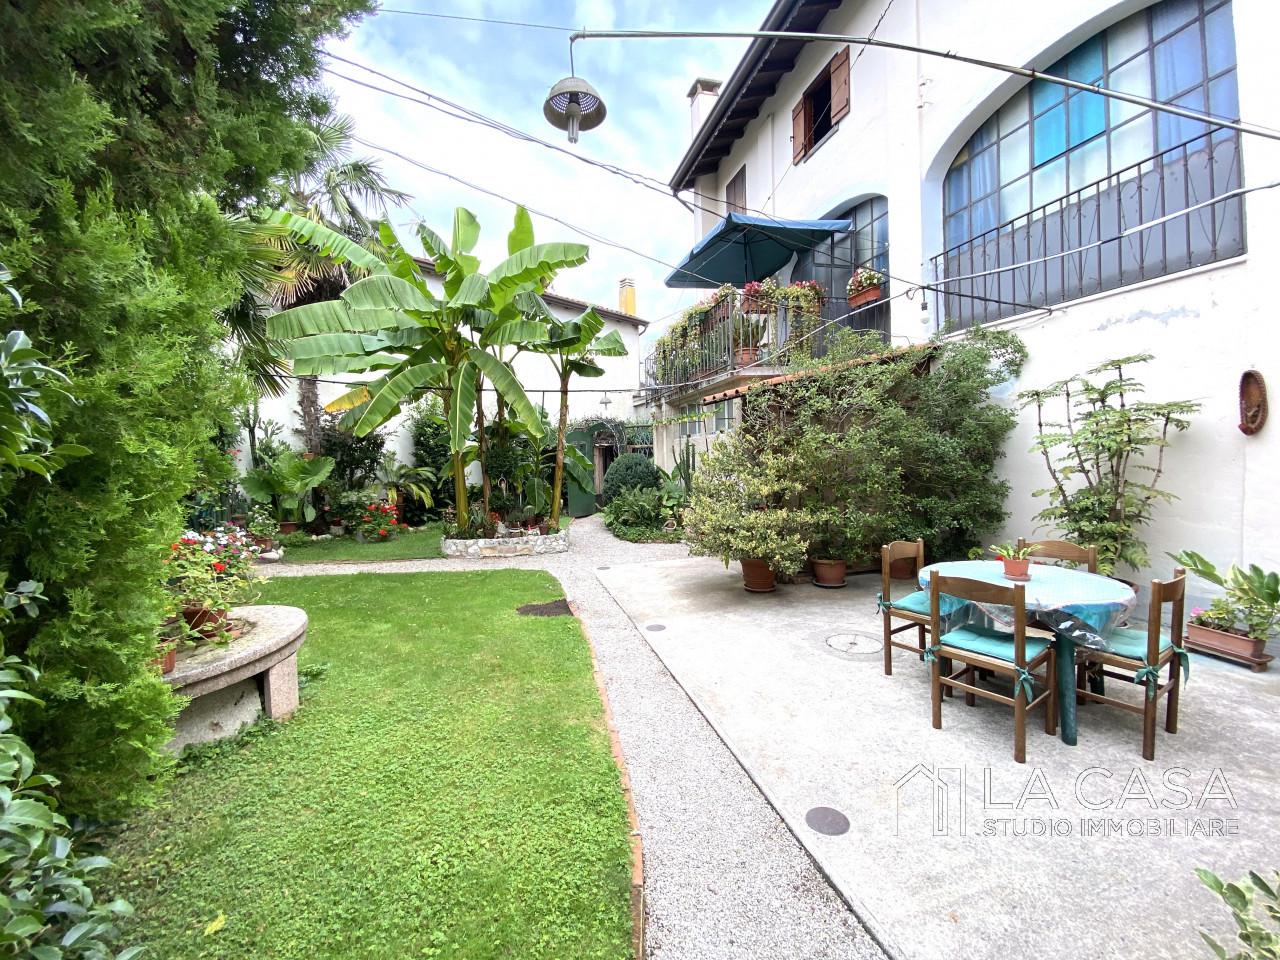 Palazzo plurifamiliare in vendita a Valvasone Arzene - Rif. P3 https://images.gestionaleimmobiliare.it/foto/annunci/200827/2284141/1280x1280/001__img_3734_wmk_0.jpg